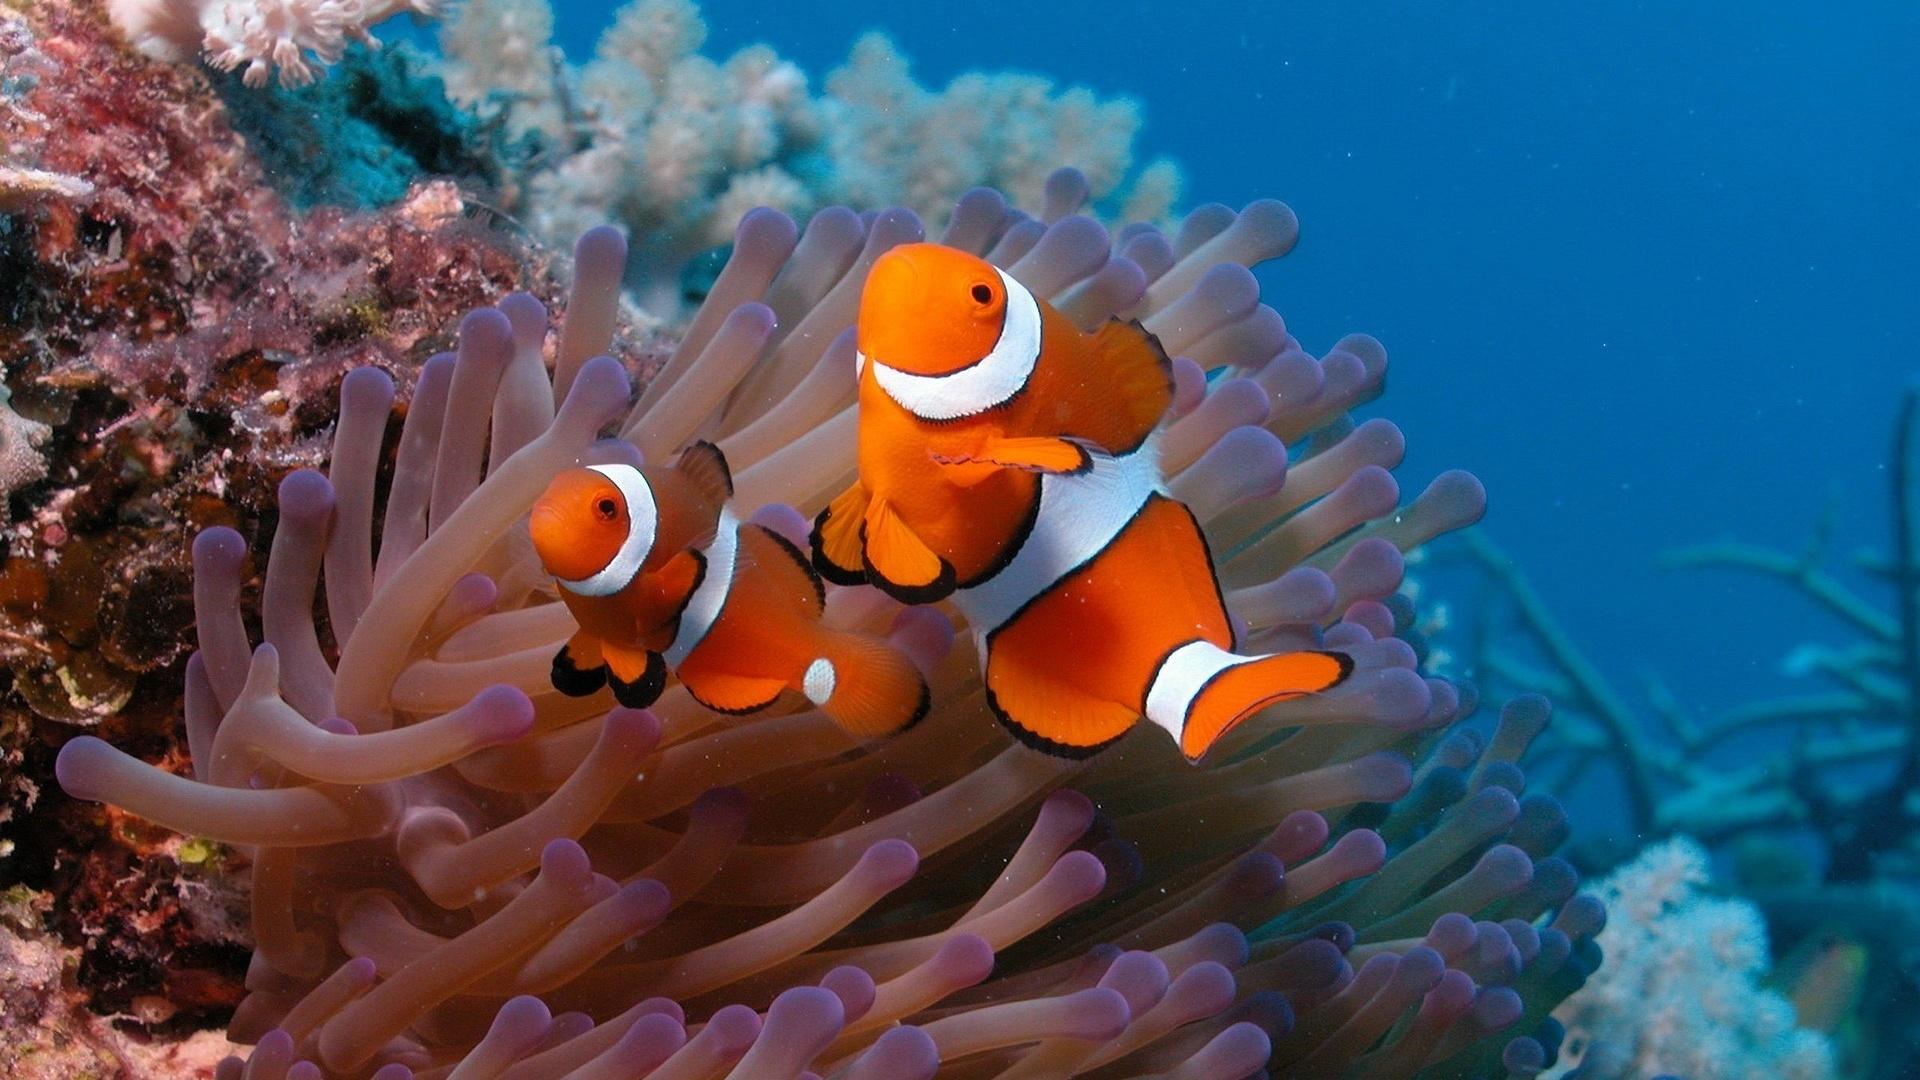 Wallpaper Underwater world, beautiful clown fish 1920x1200 ...